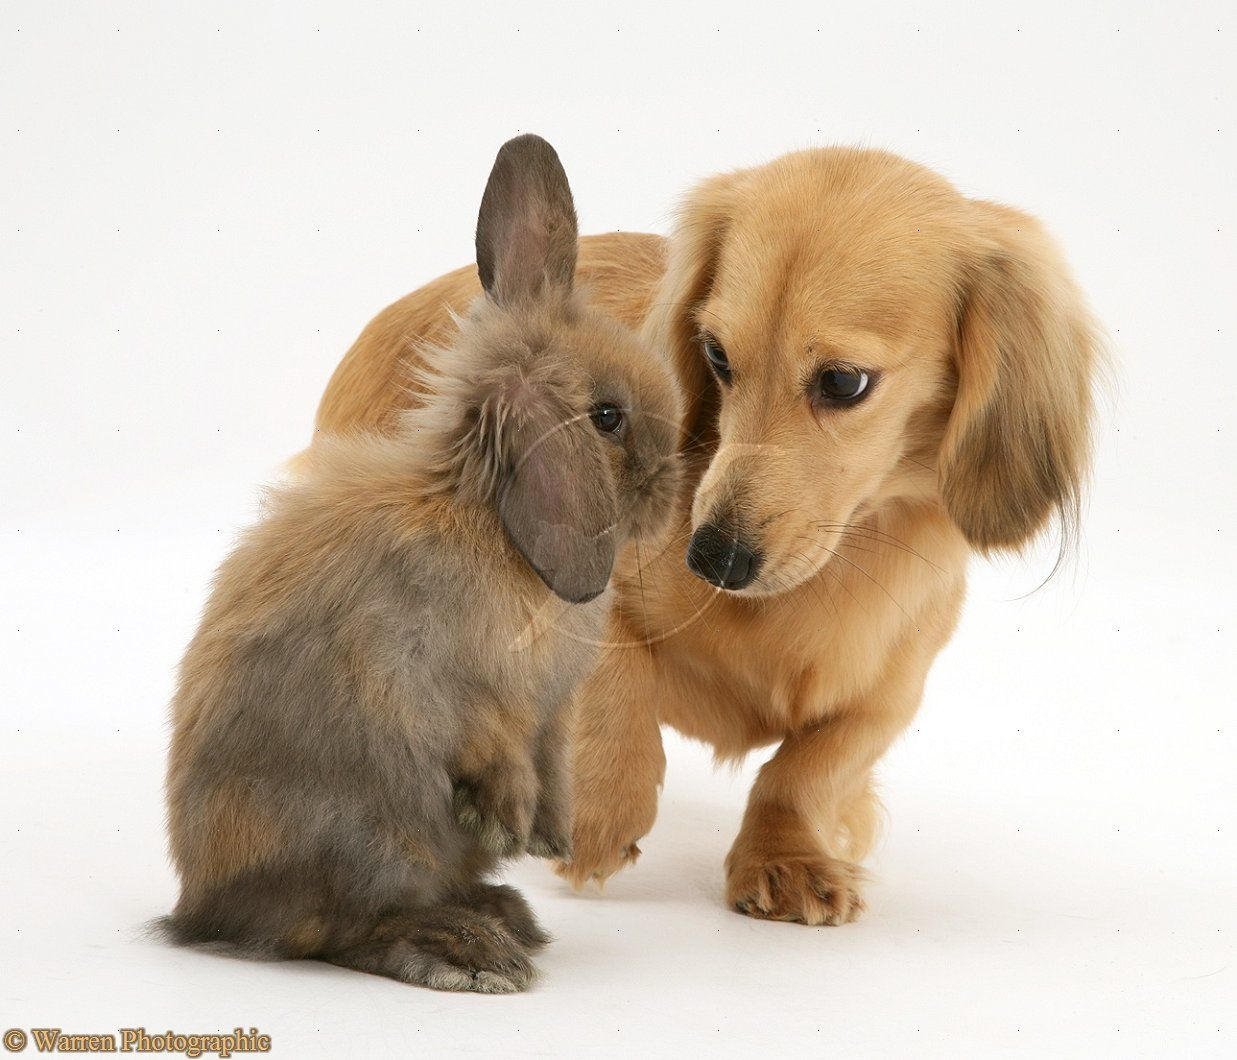 Lop Rabbit Meets Cream Dapple Dachshund Pup Photo Wp17843